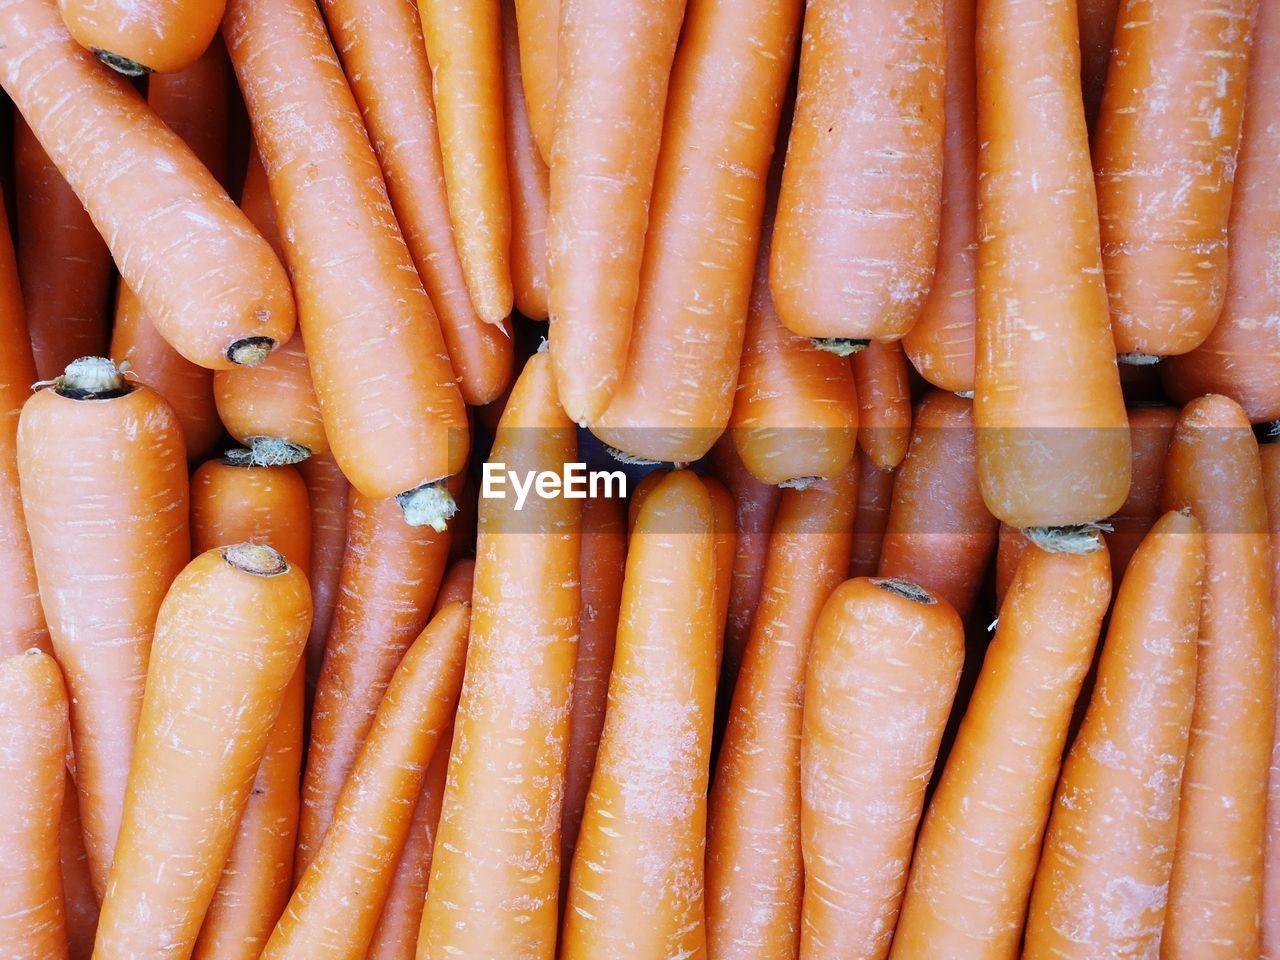 Full frame shot of carrots for sale at market